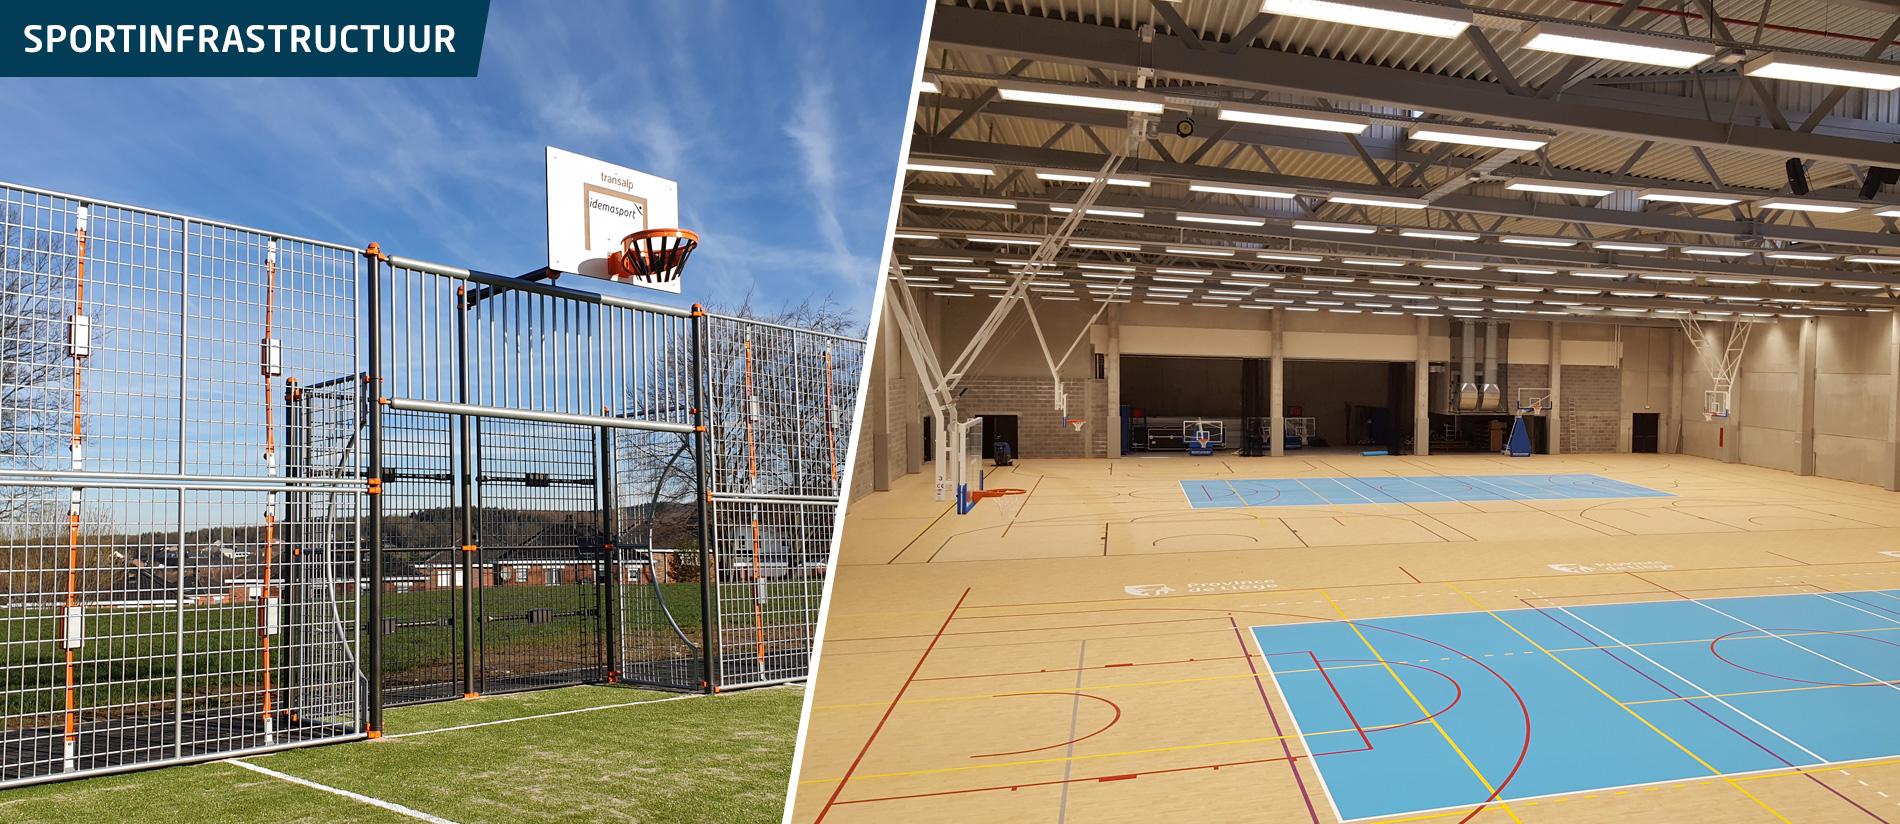 Sportinfrastructuur | Idema